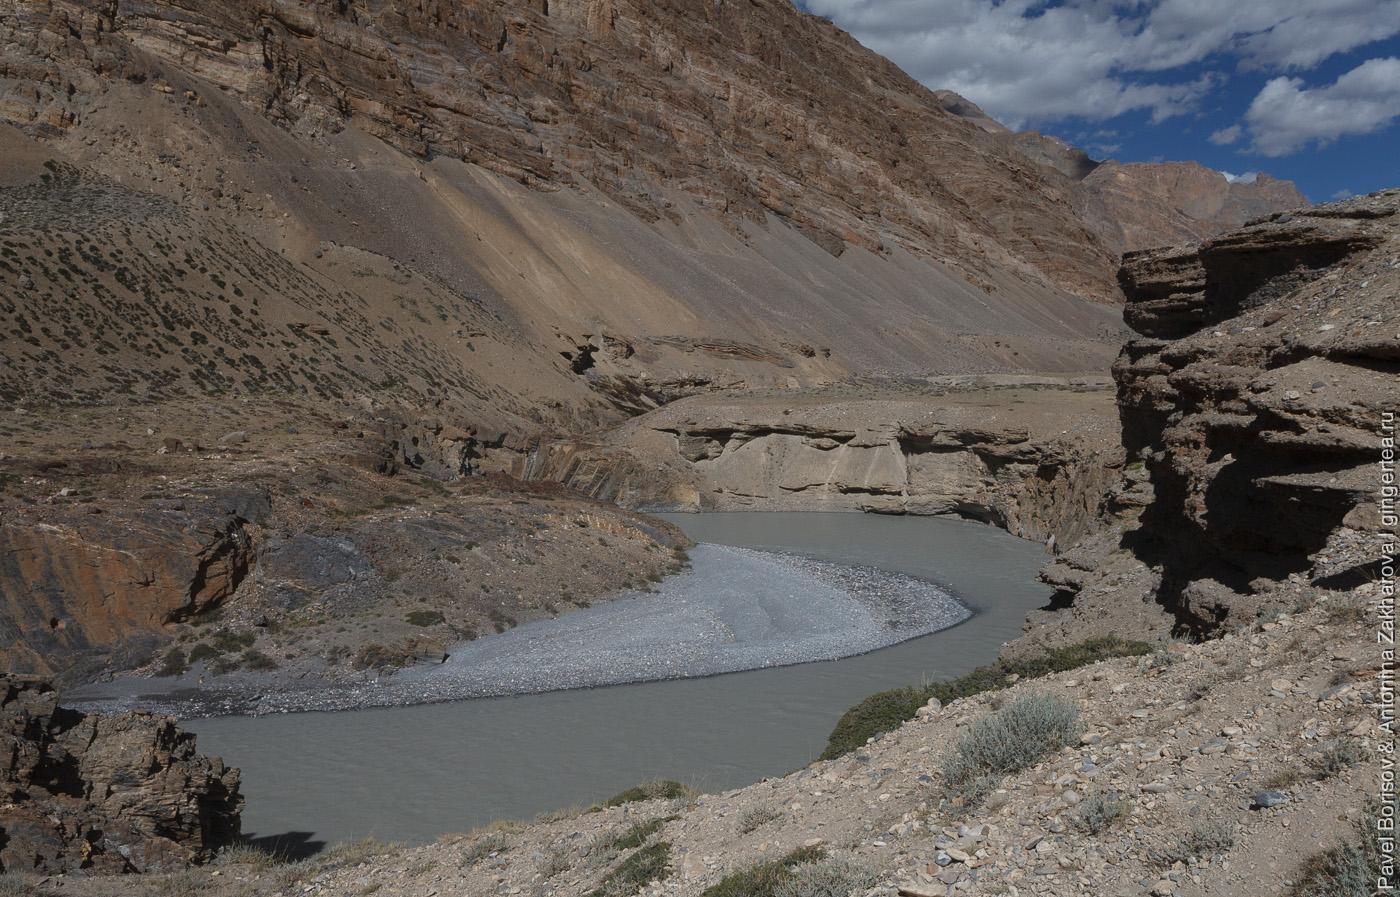 Река Малунг, Индийские Гималаи